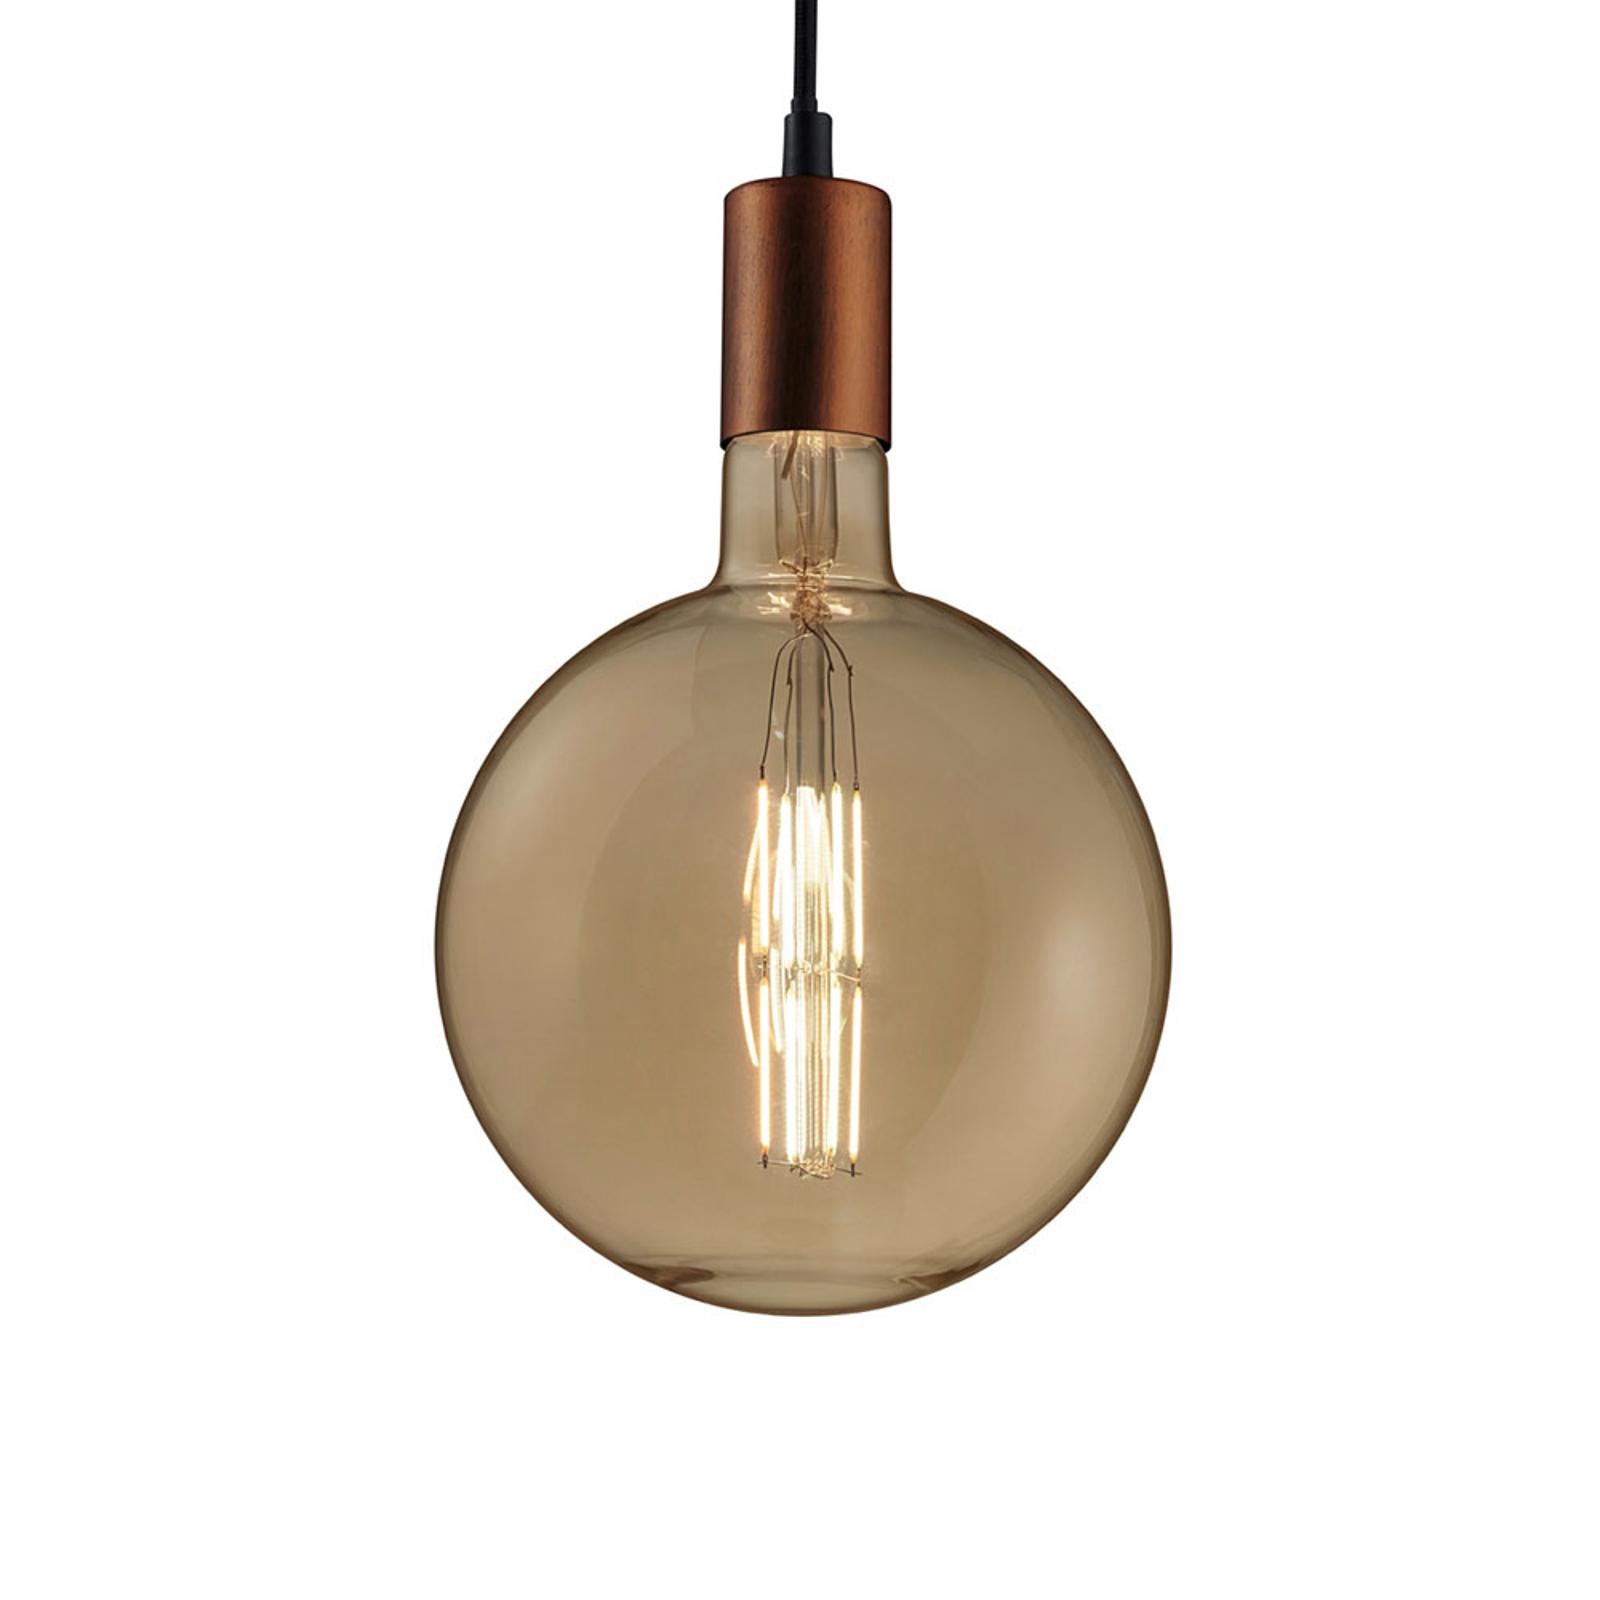 WiZ LED-Globelampe E27 6,5W 650lm dimmbar Filament